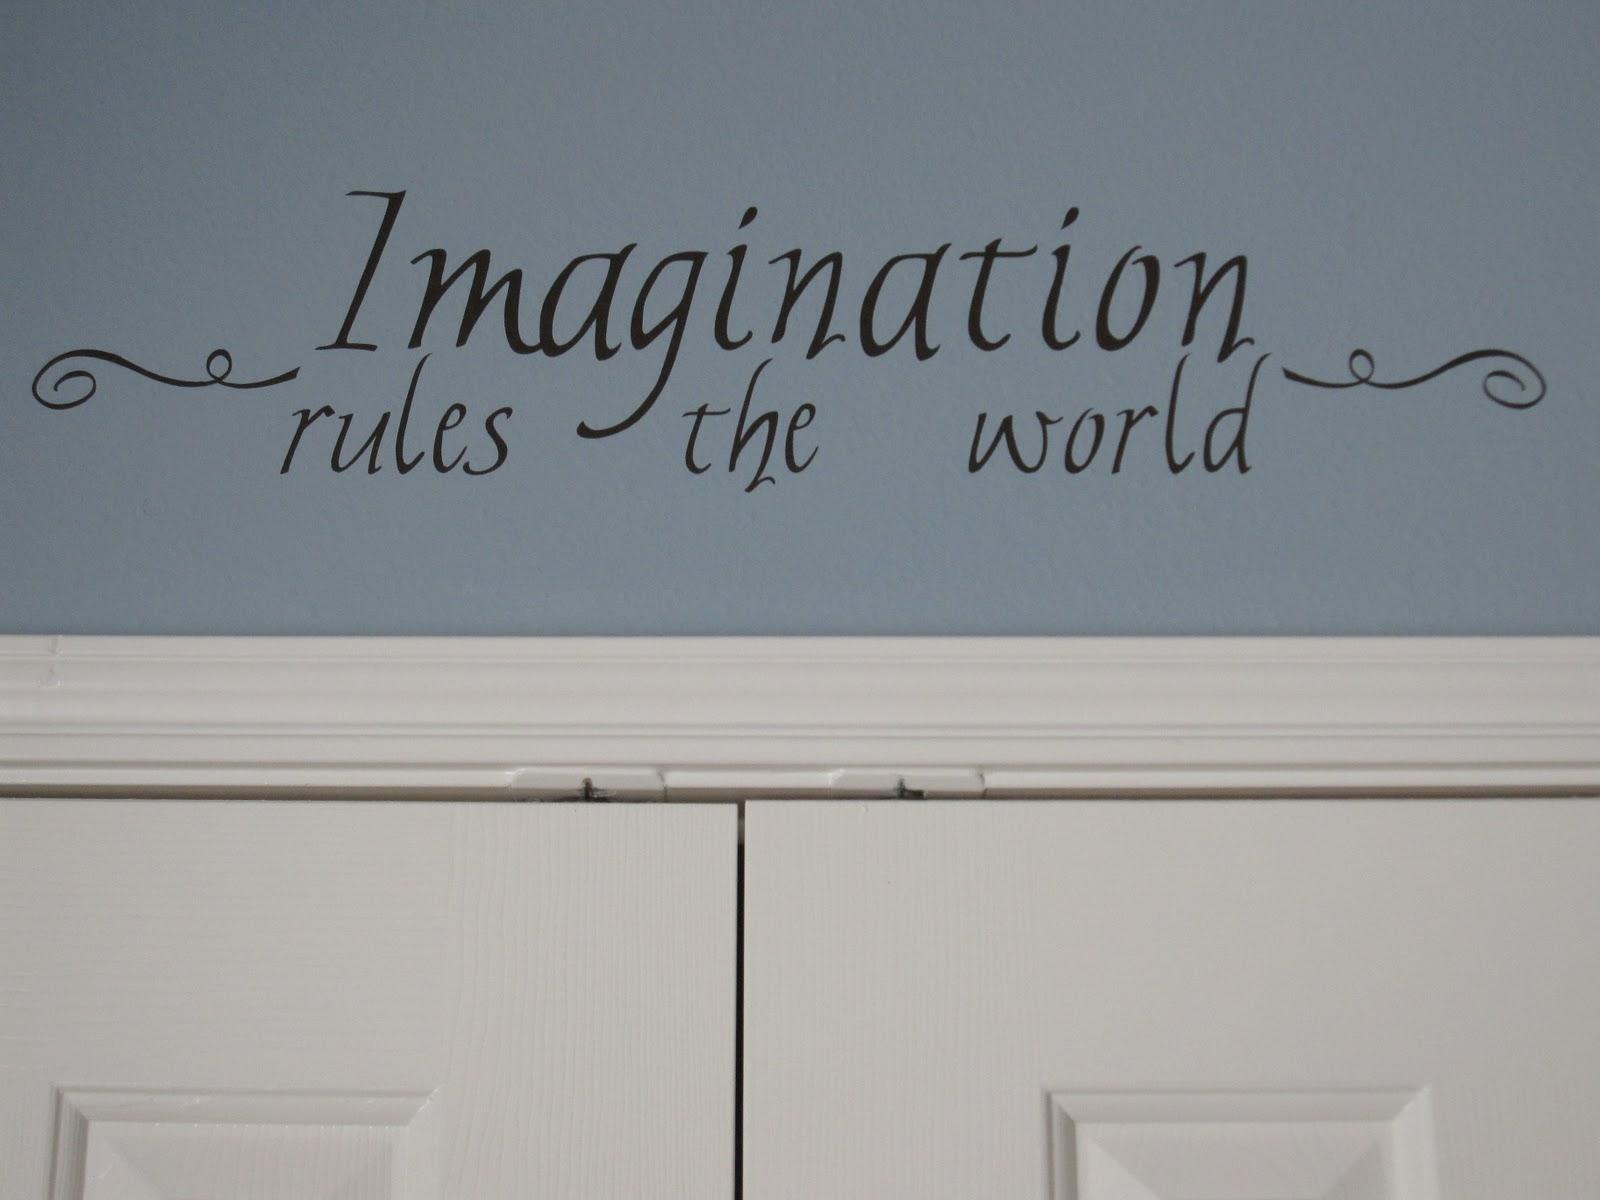 craft room wall quotes quotesgram. Black Bedroom Furniture Sets. Home Design Ideas